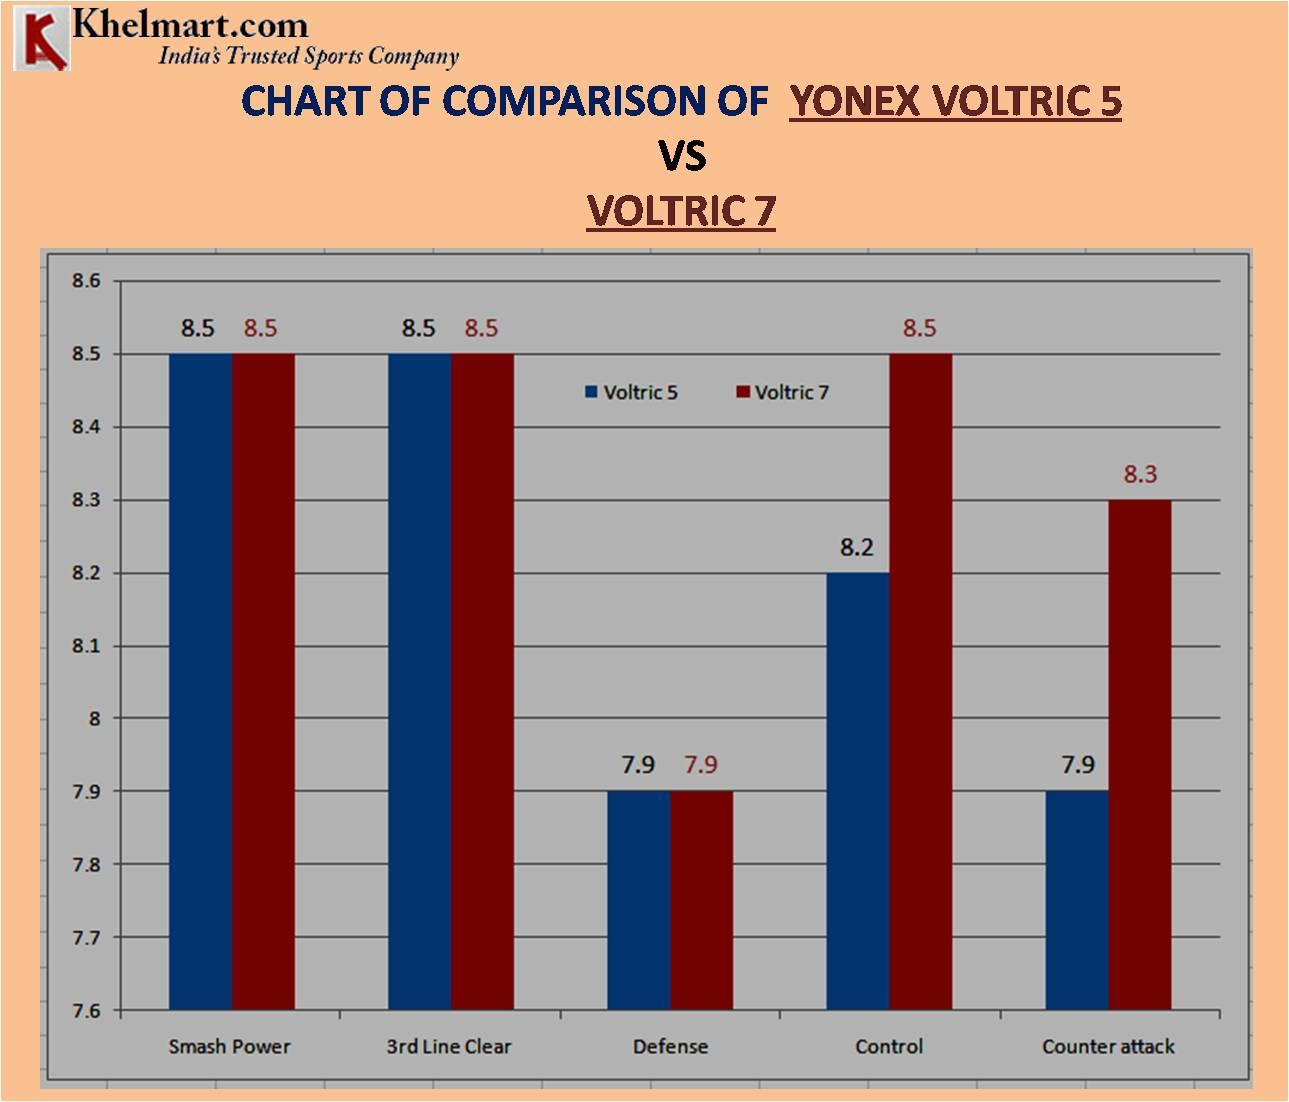 CHART OF COMPARISON OF YONEX VOLTRIC 5 VS VOLTRIC 7